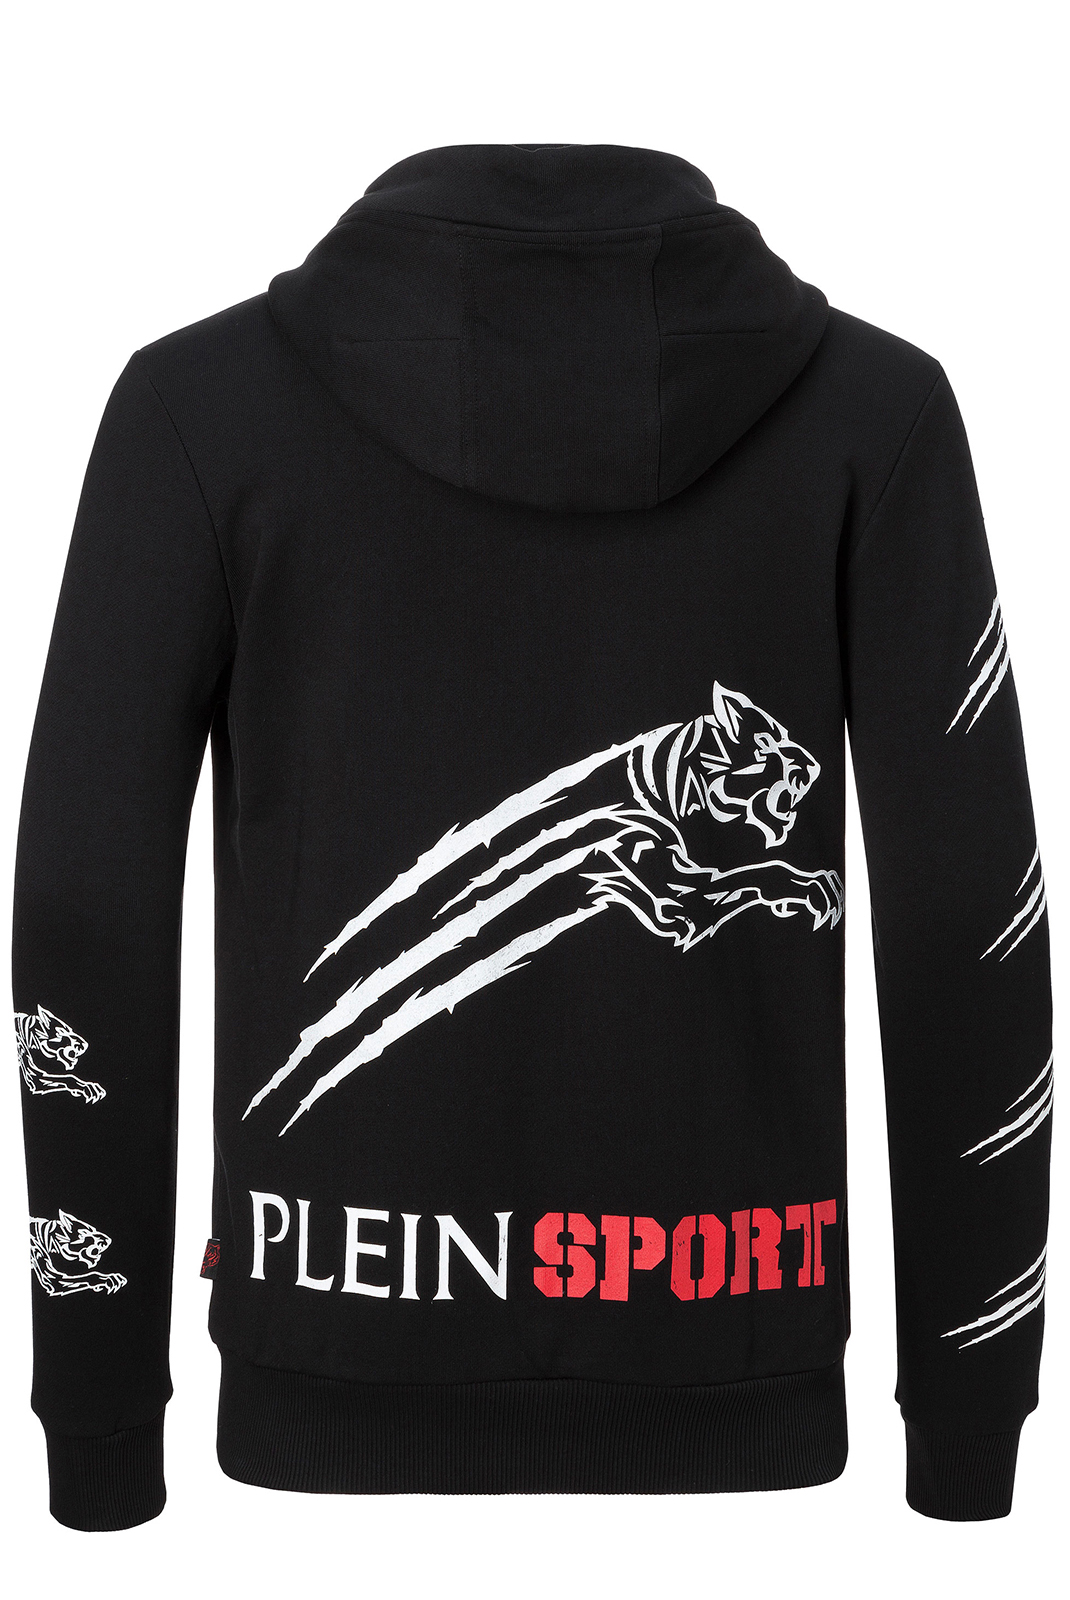 Blousons / doudounes  Plein Sport F17C MJB0137 02 BLACK